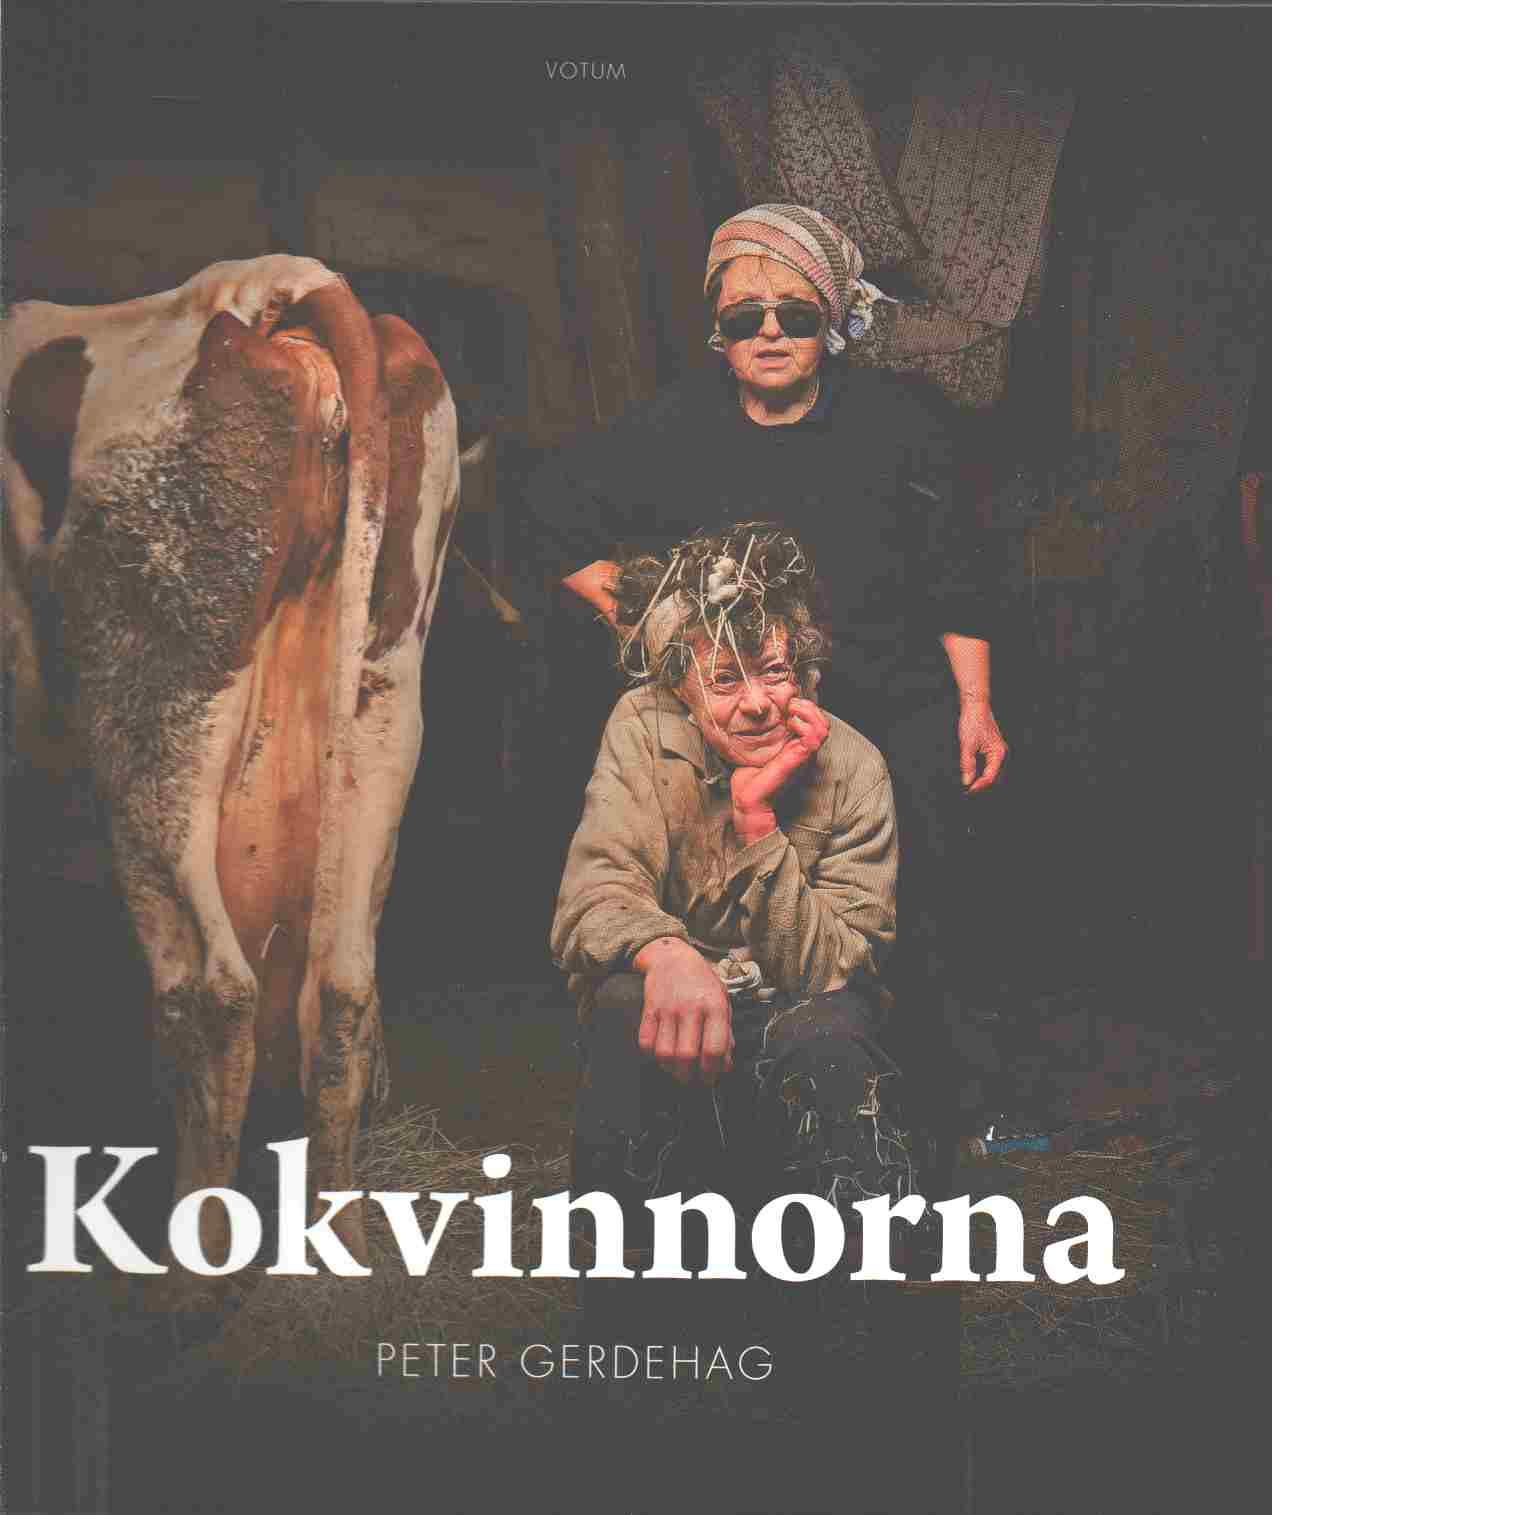 Kokvinnorna - Gerdehag, Peter